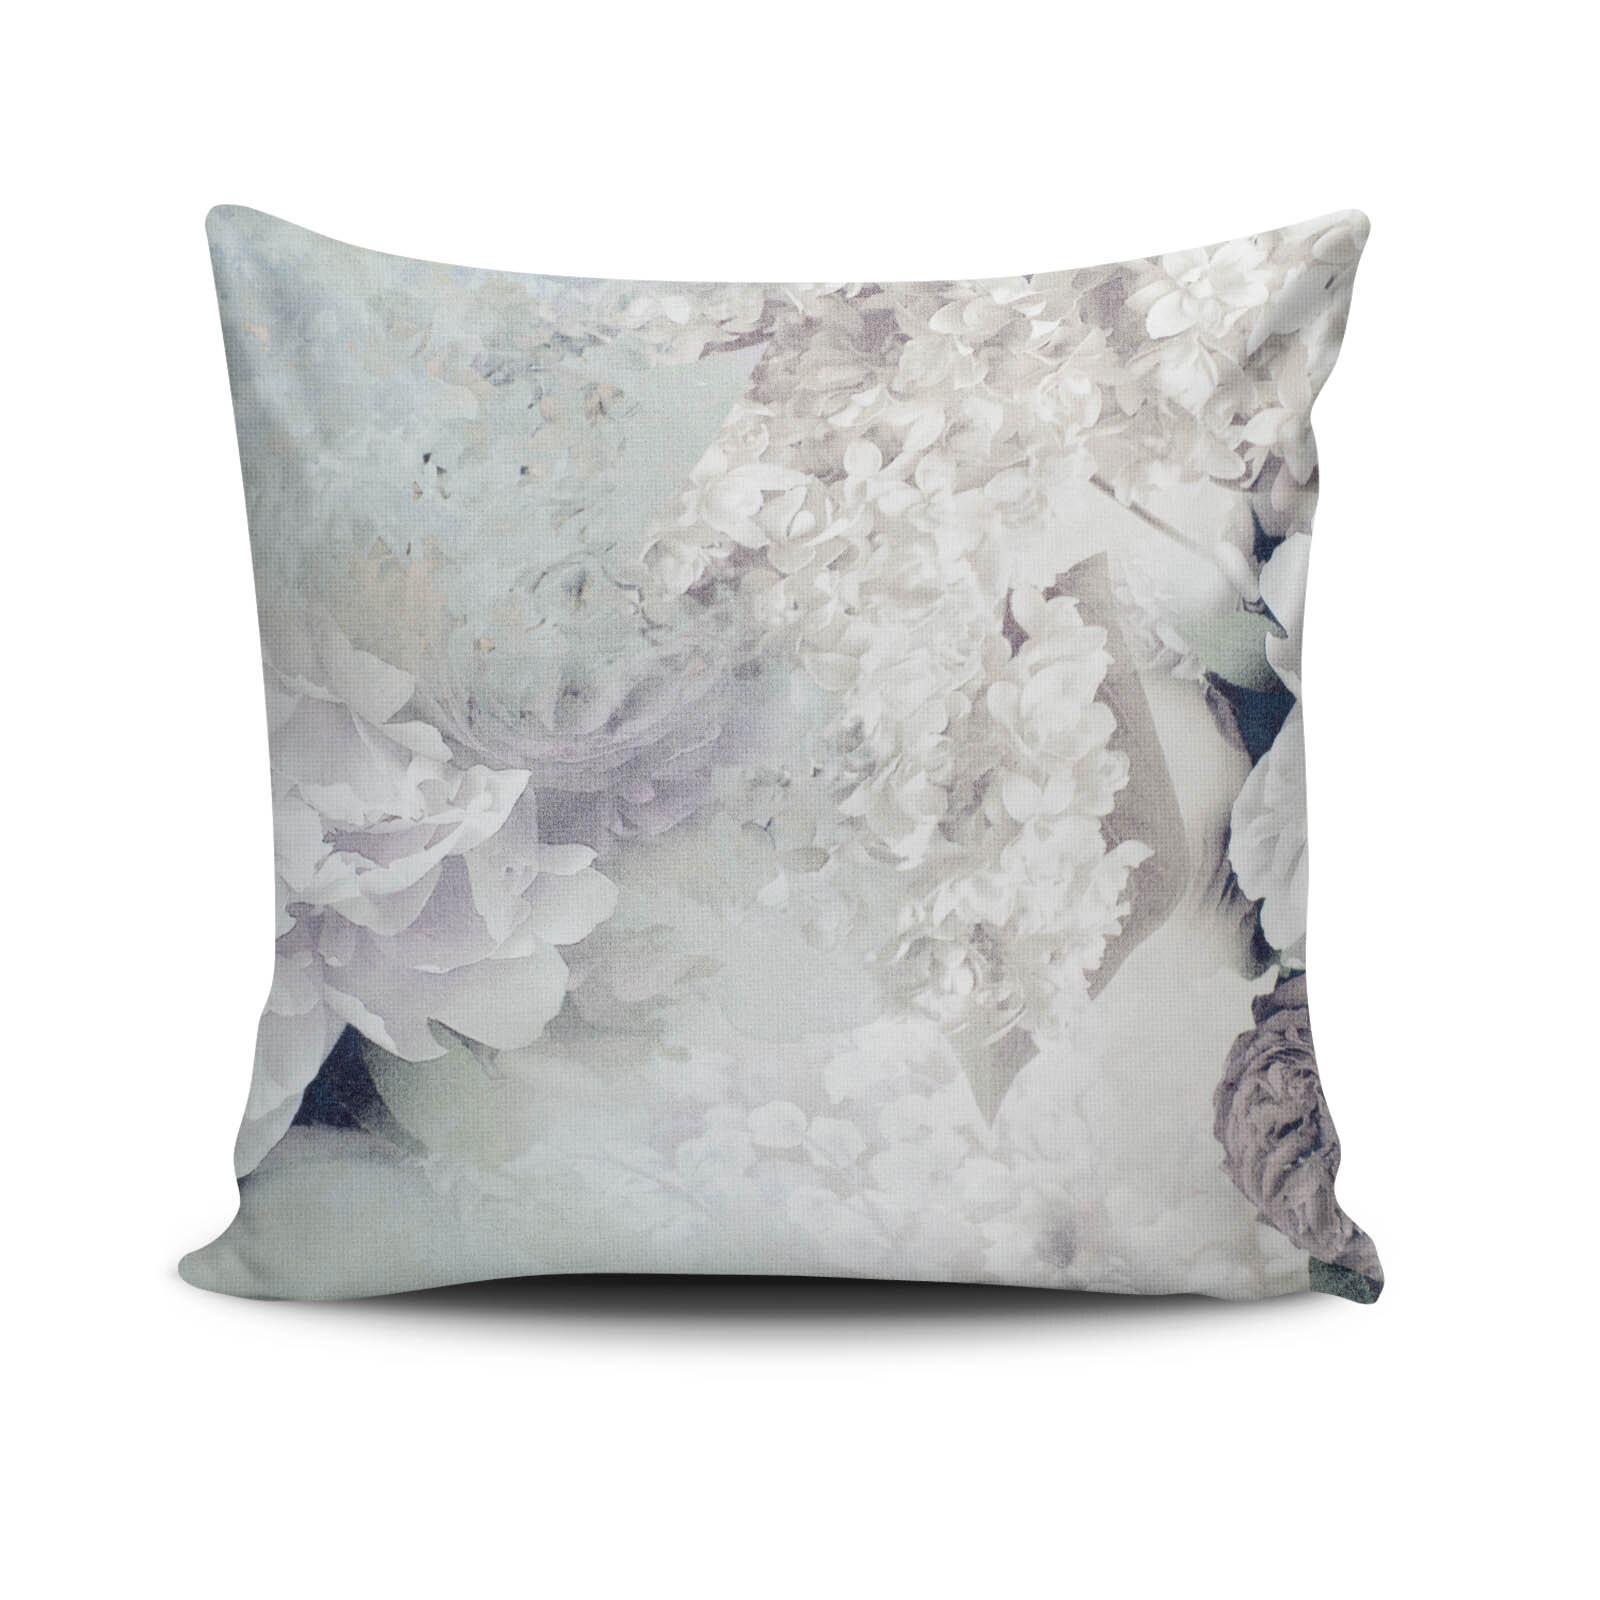 Perna decorativa Cushion Love, Dimensiune: 45 x 45 cm, Material exterior: 50% bumbac / 50% poliester 768CLV0153